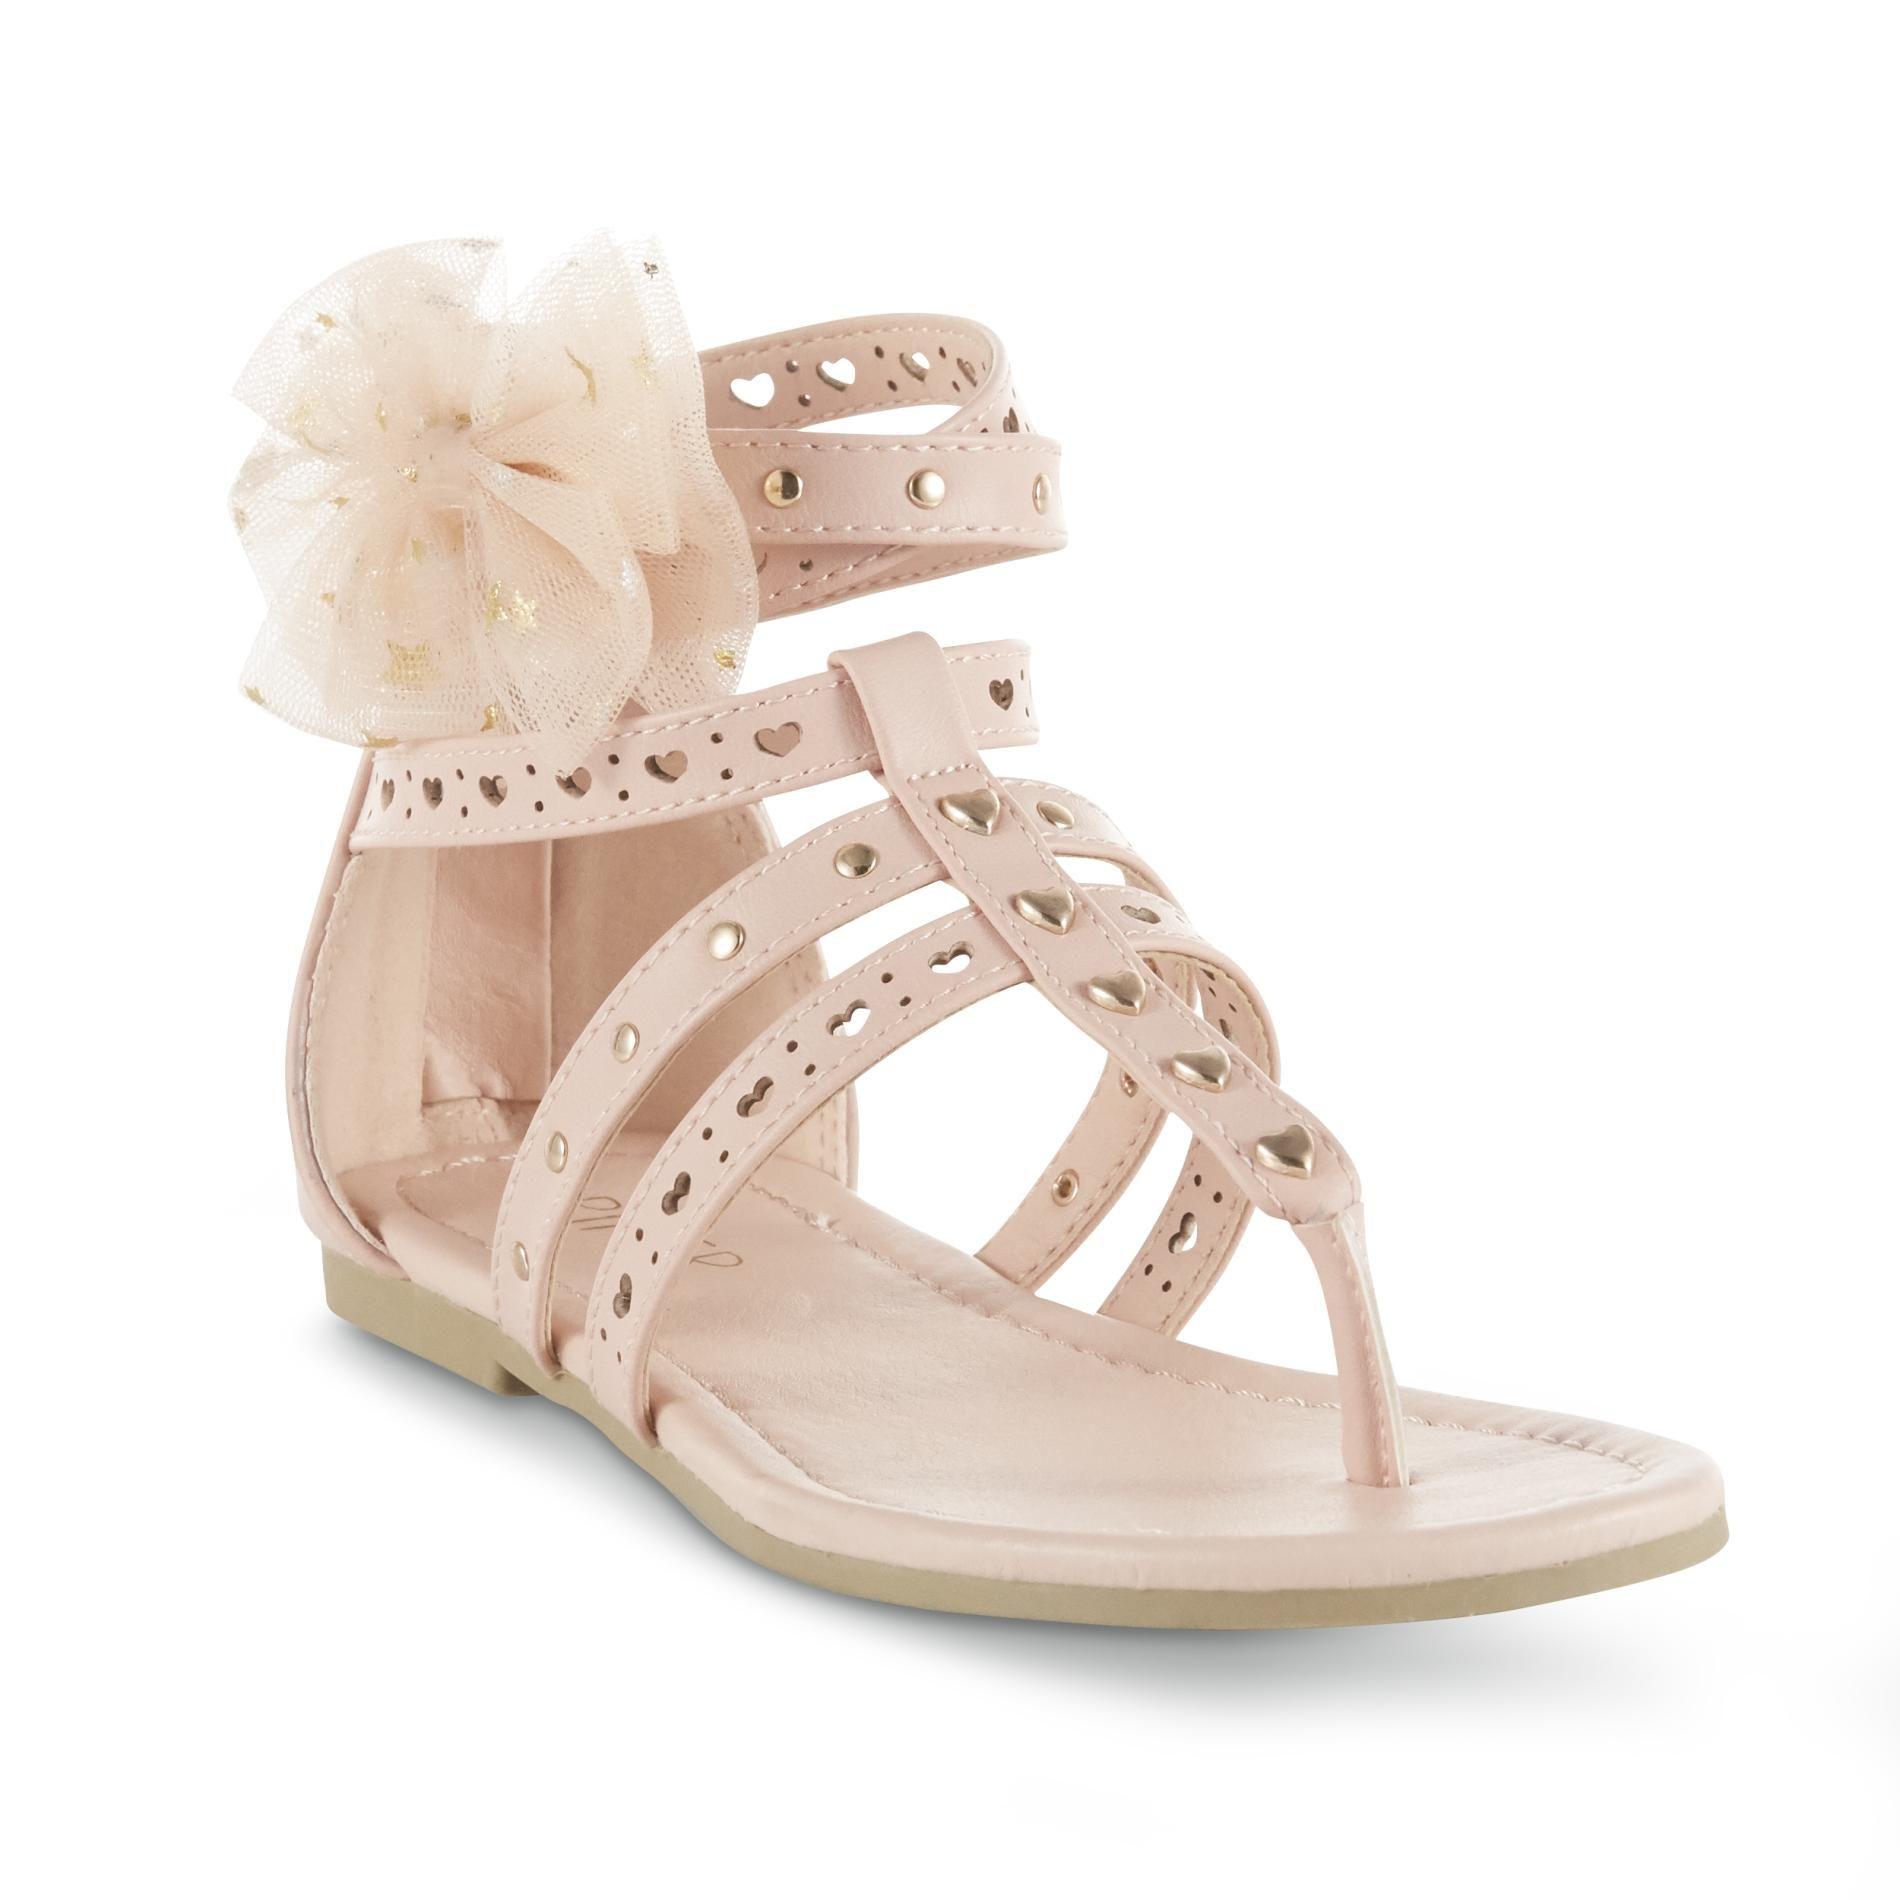 Piper Girls' Charity Gladiator Sandal Blush Pink, 3